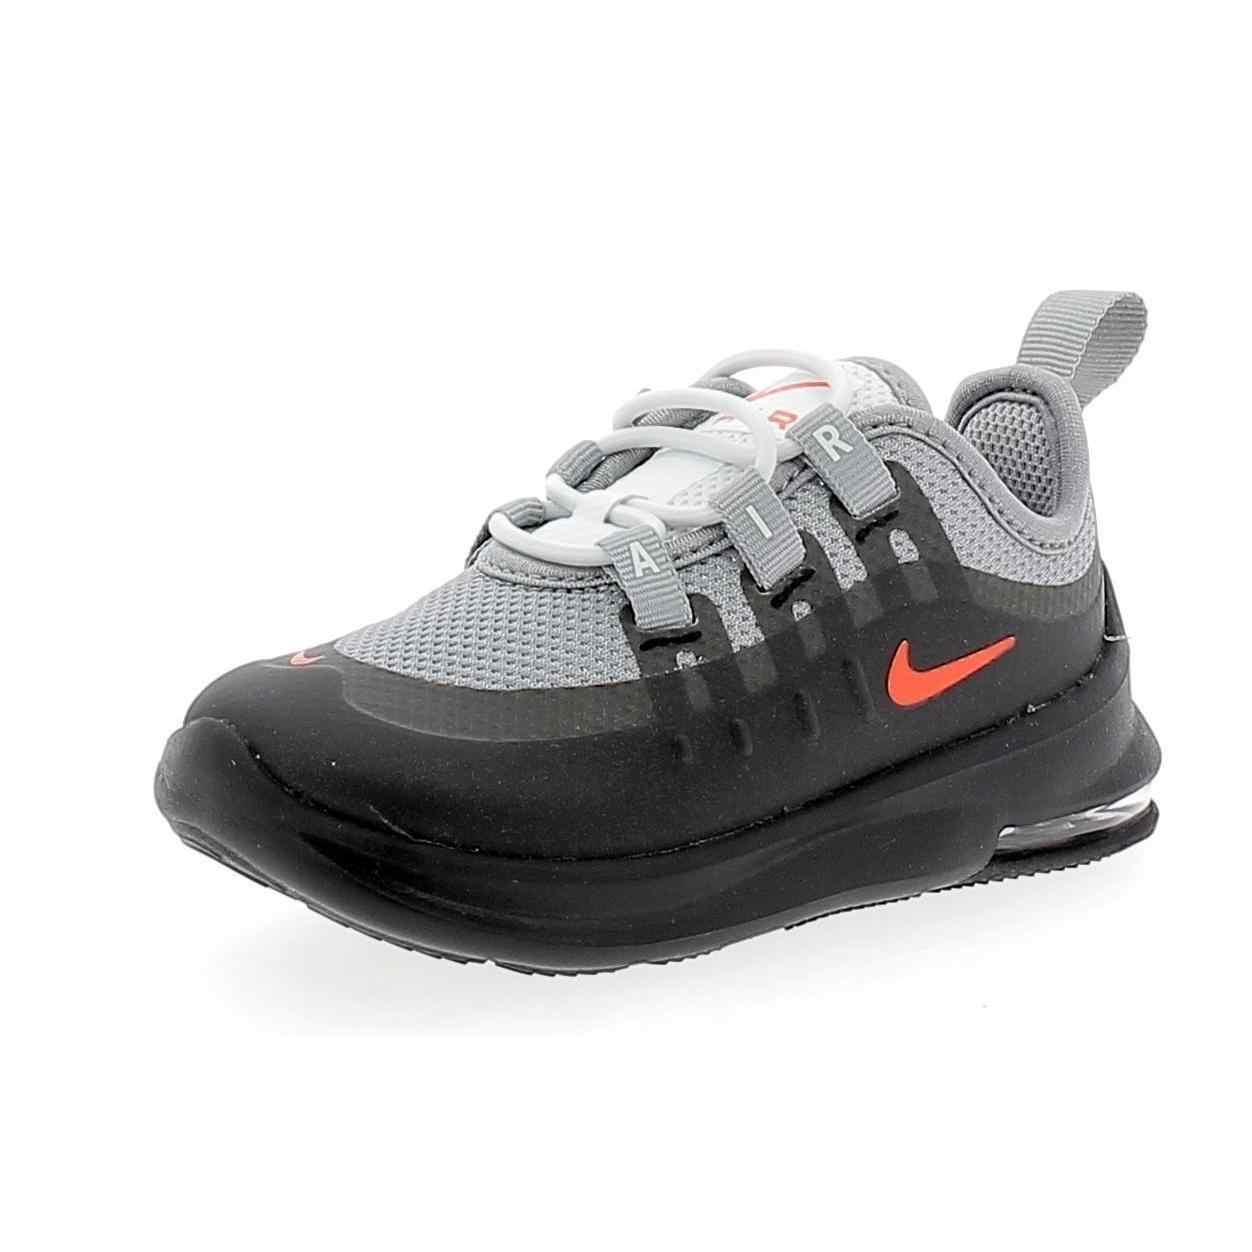 Nike Air Max Axis Td Kids Sports Shoes Grey AH5224003